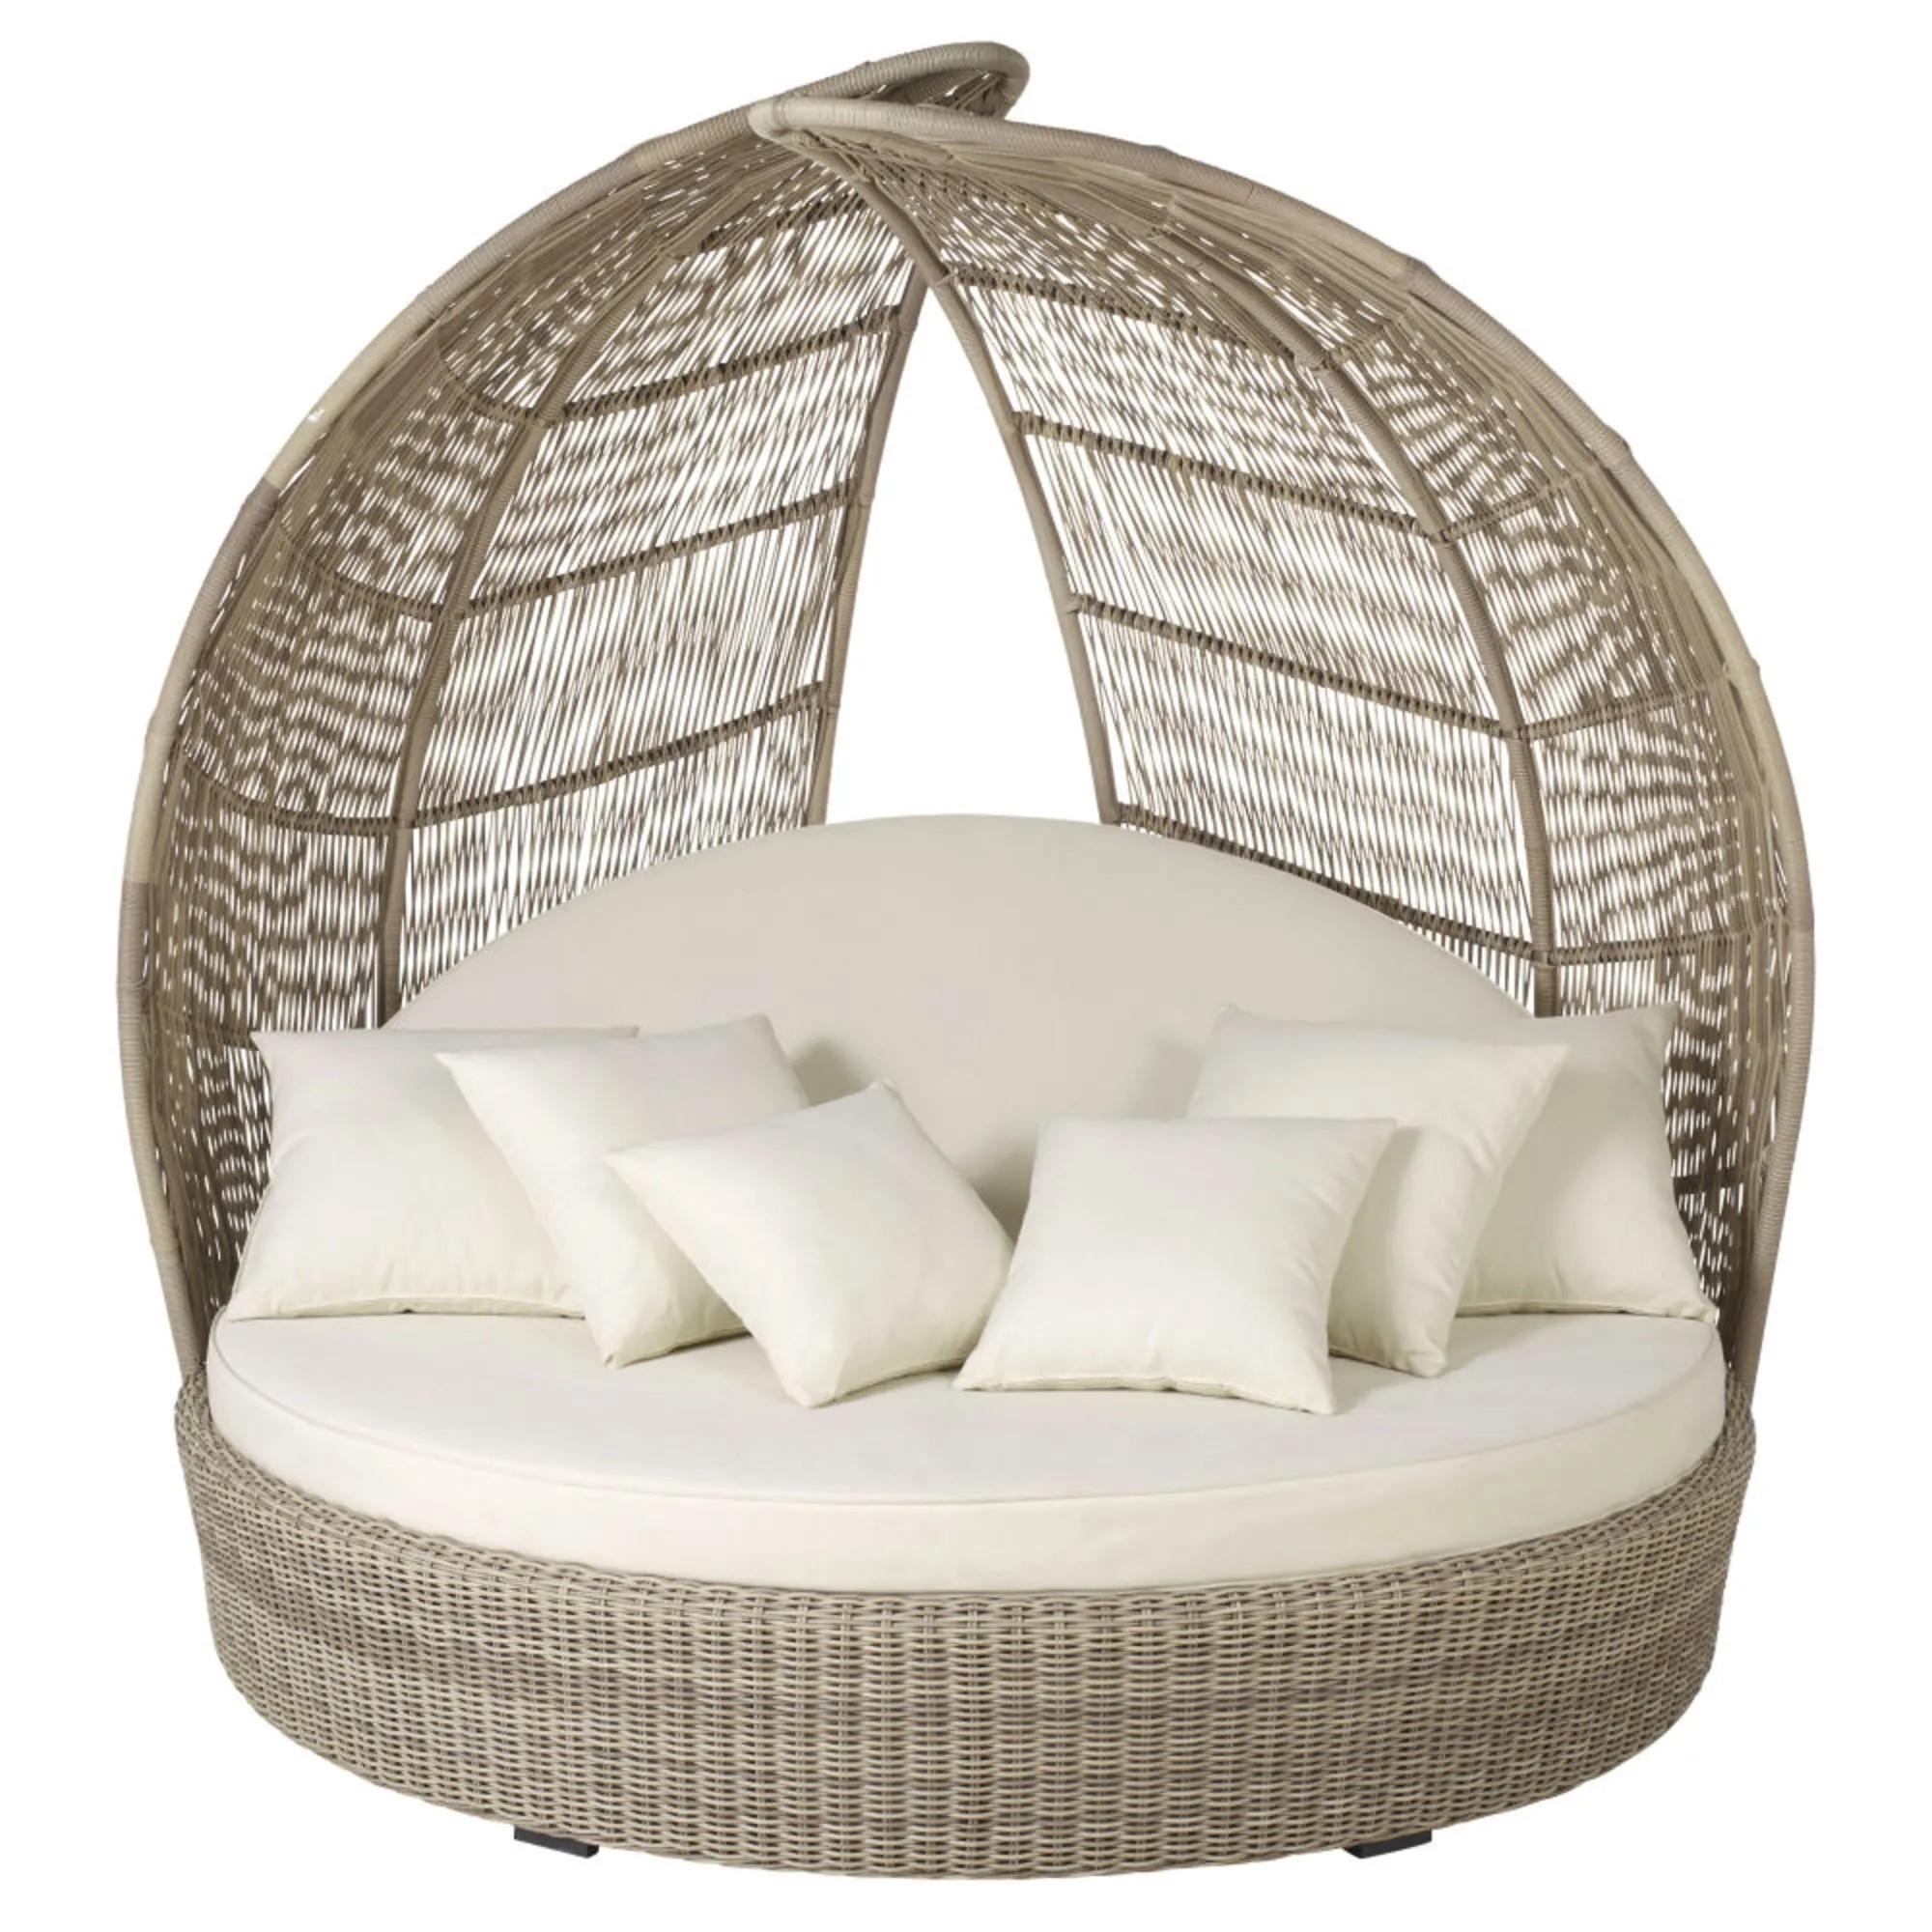 Tumbona redonda de 2 plazas de resina y cojines blancos PARADISIO